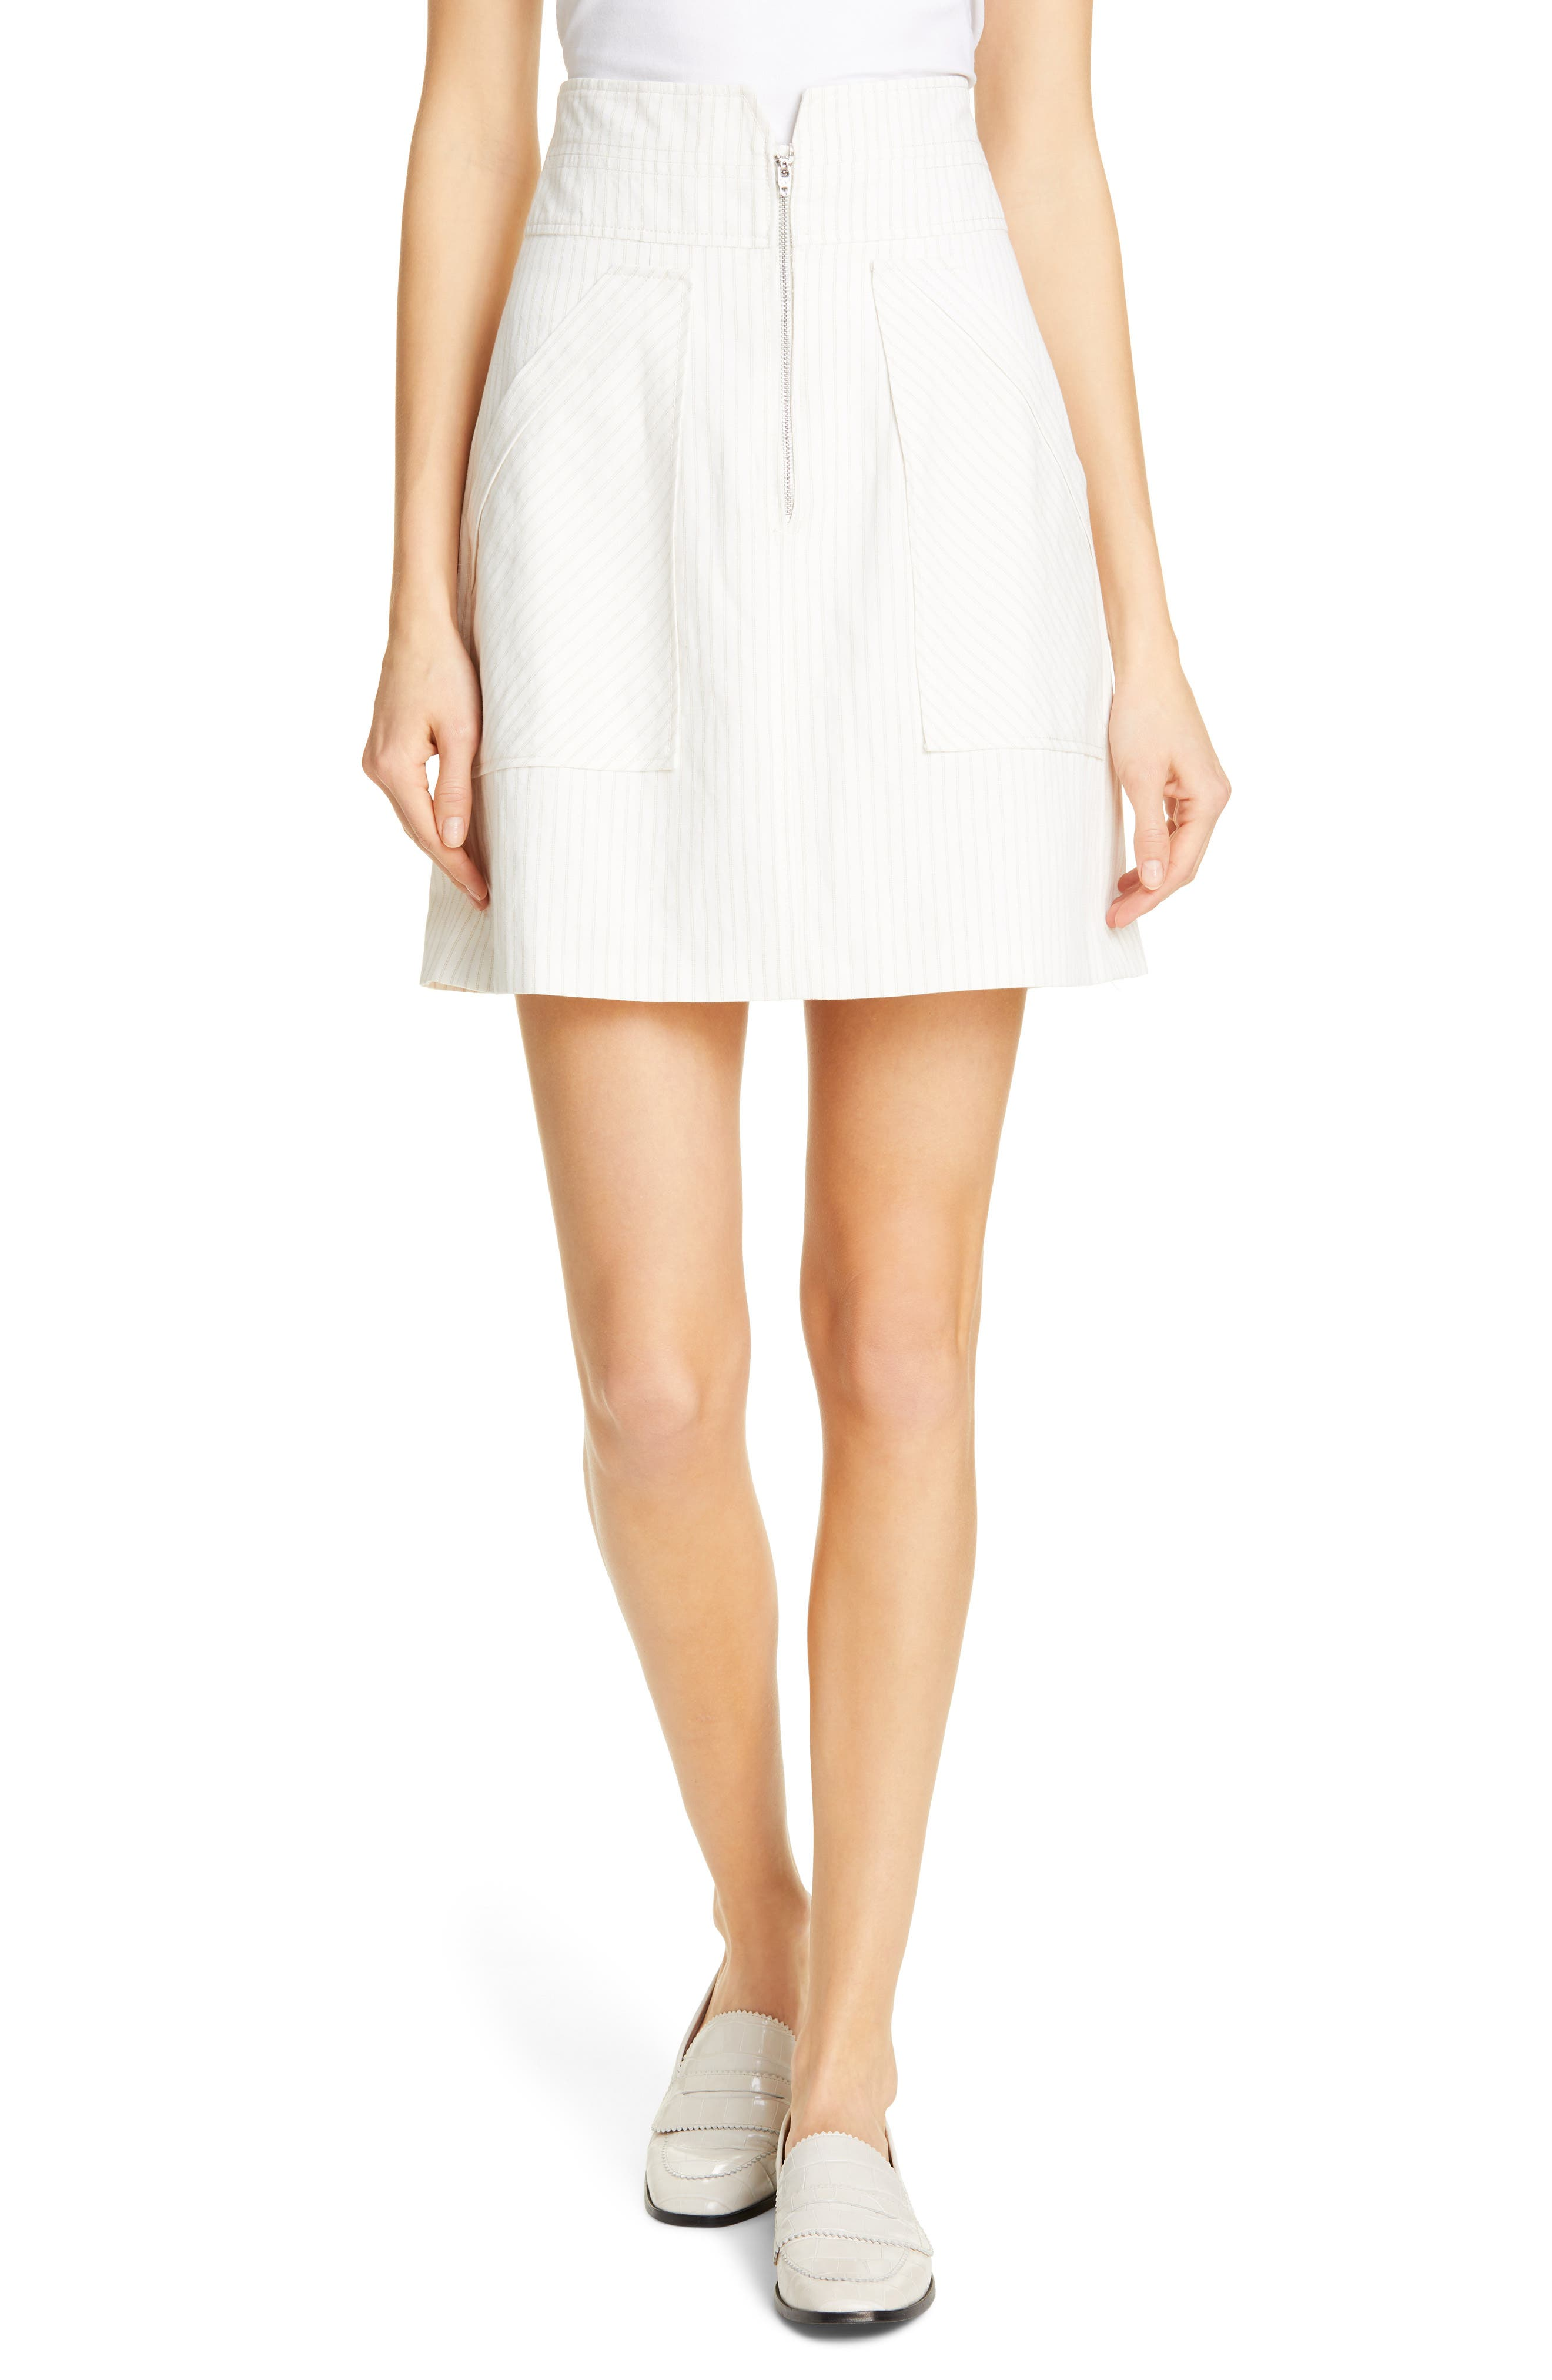 REBECCA TAYLOR Zip Front Pinstripe Cotton & Linen Skirt, Main, color, SNOW COMBO